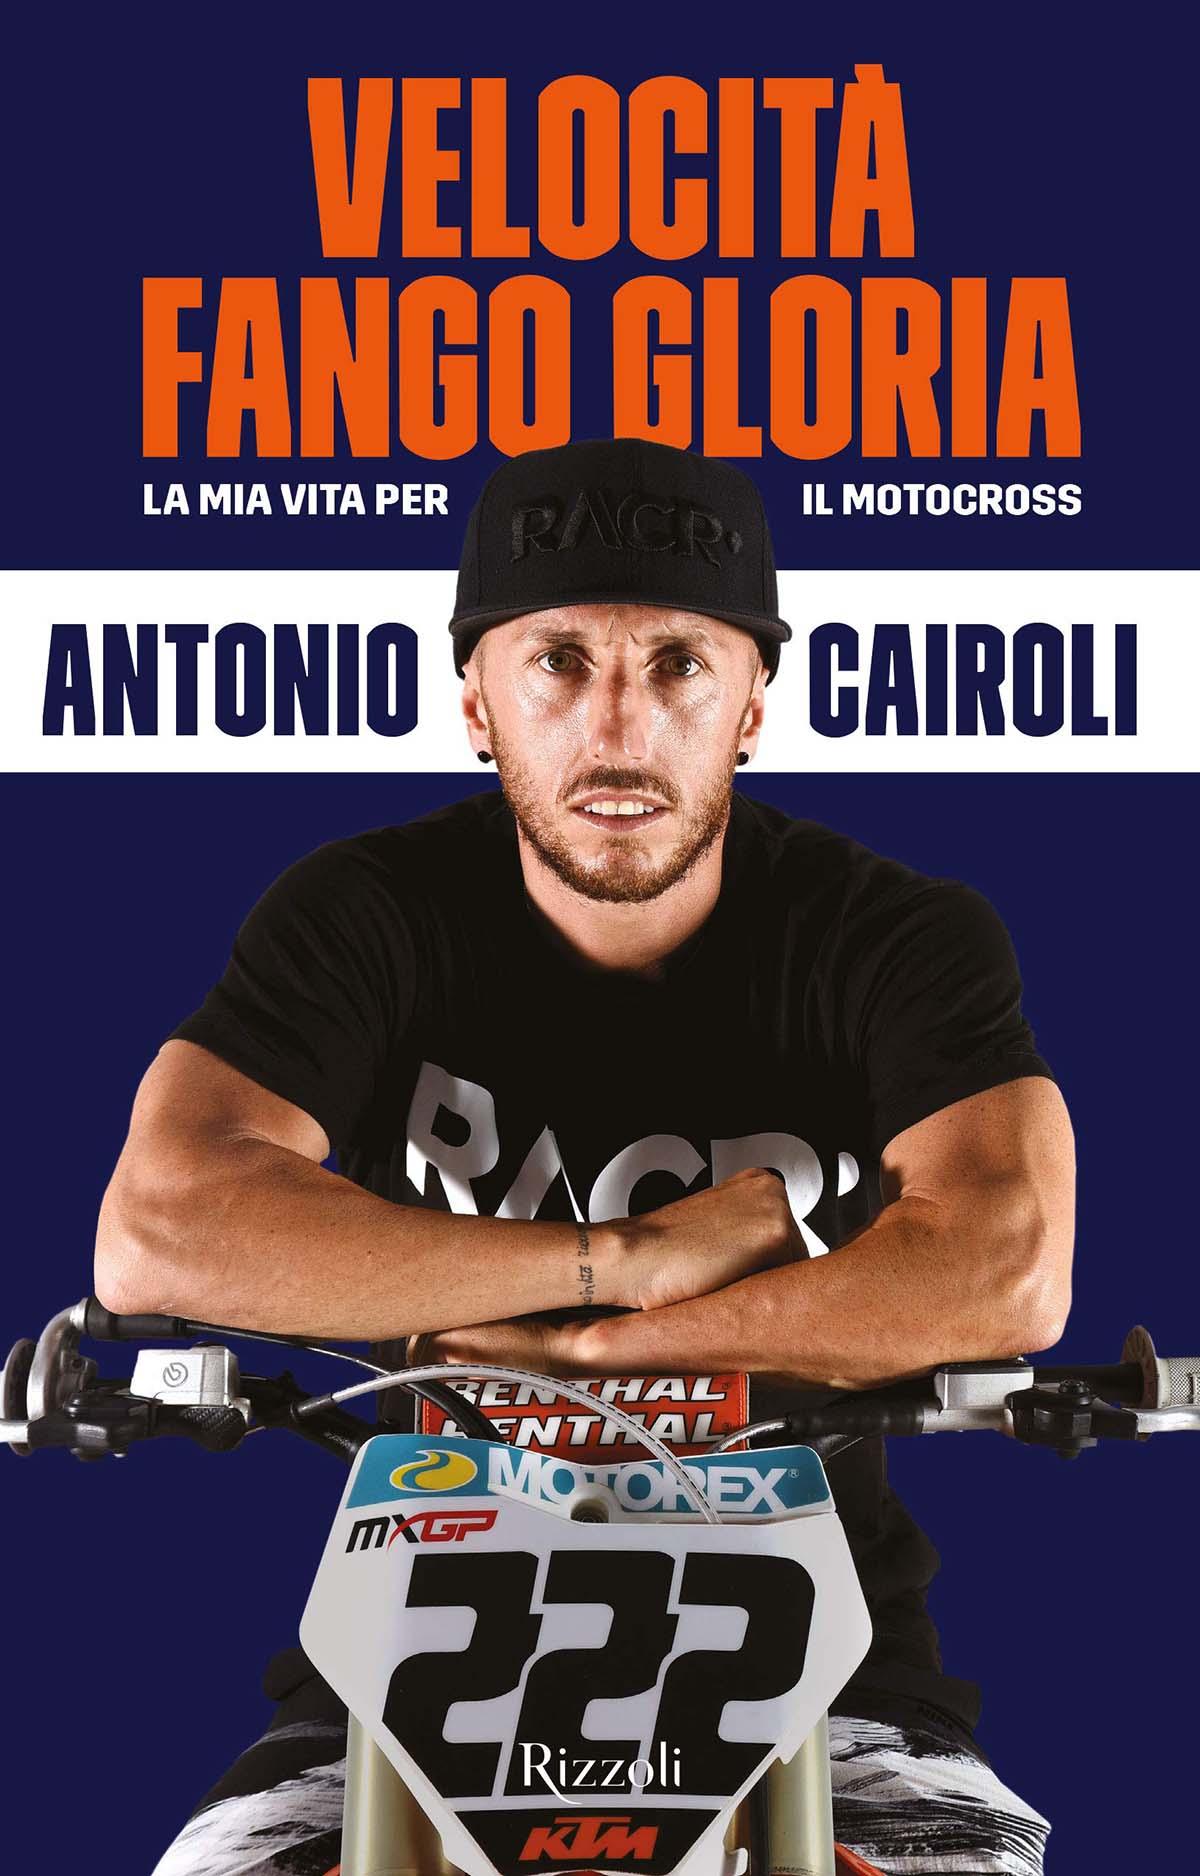 Antonio Tony Cairoli